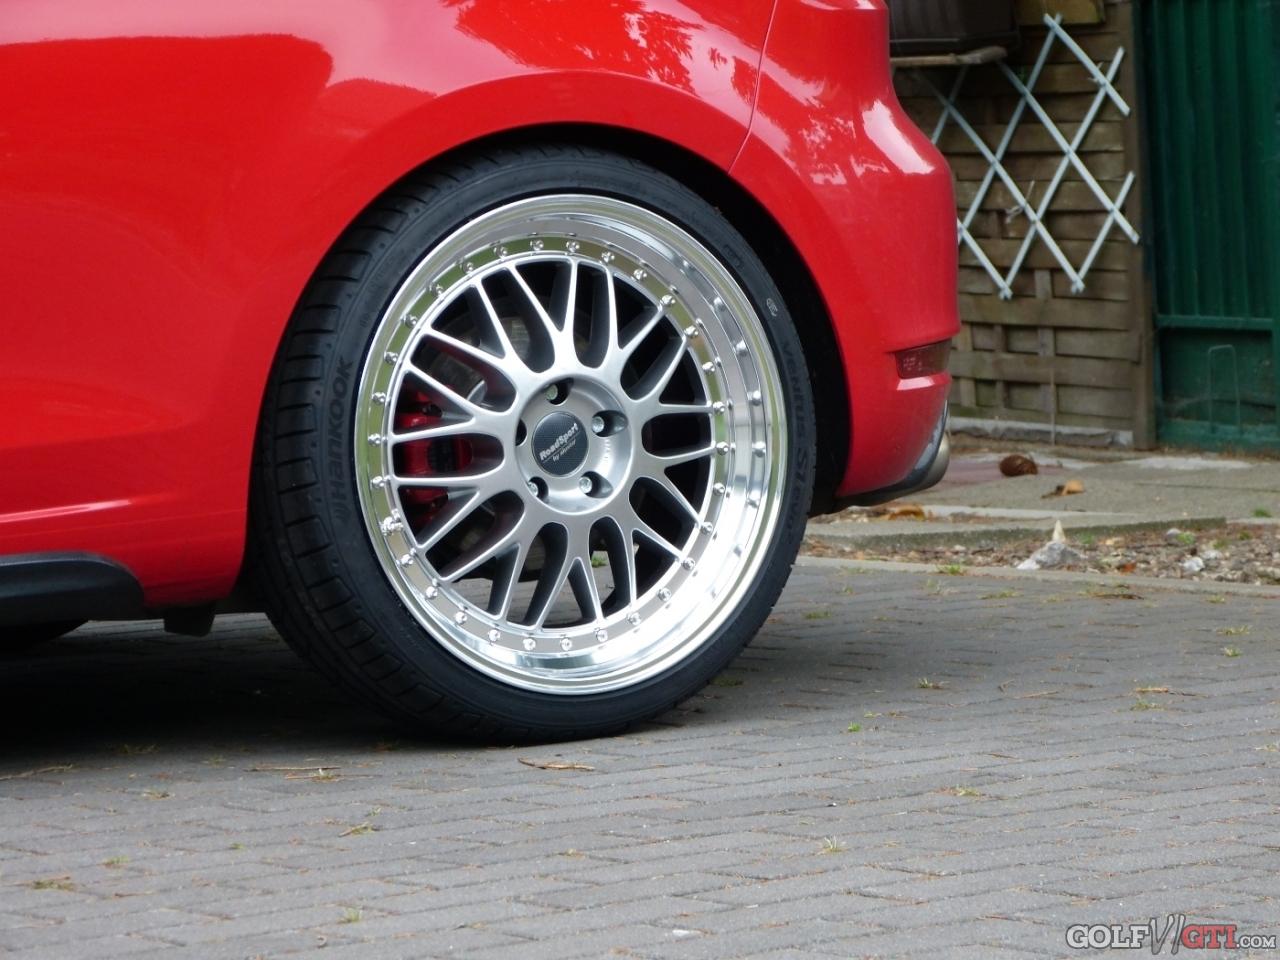 Mega Deal Roadsport Quot Le Mans Optikfelgen Quot Mit Geschwungenem Stern F 252 R 690 00 Satz Einmalig